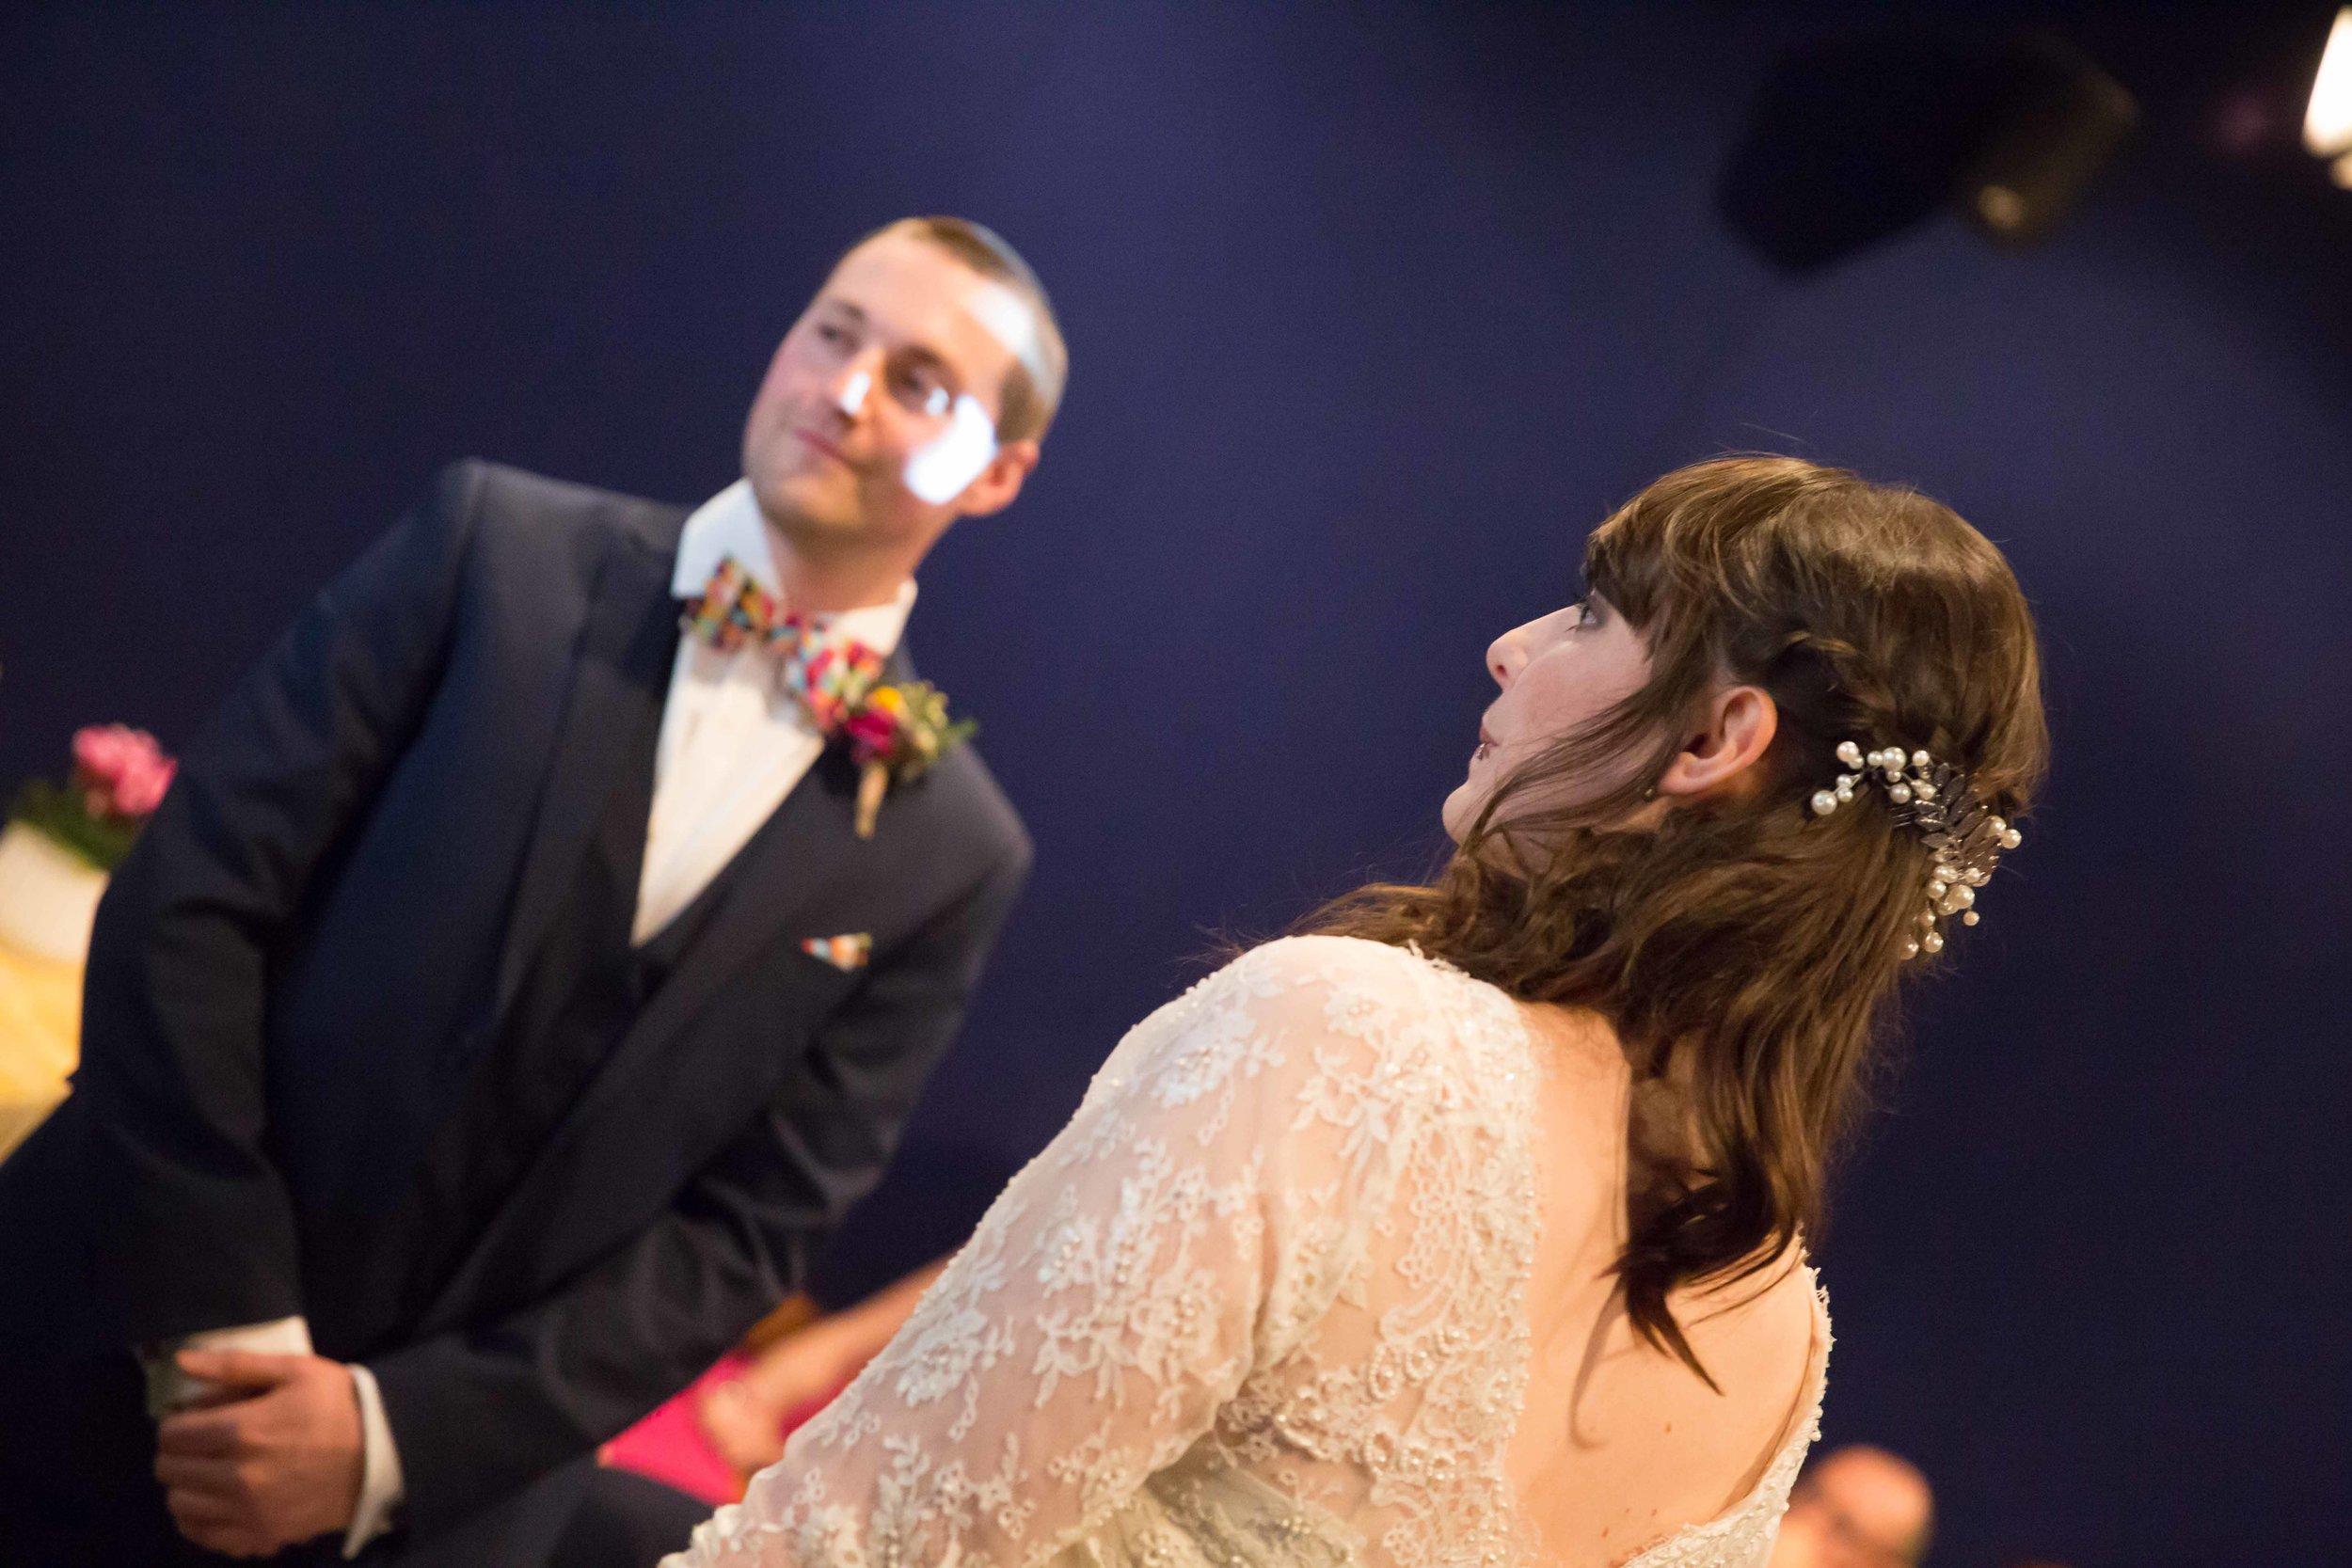 Adam & Faye - Wright Wedding Photography - Bristol Wedding Photographer -98.jpg